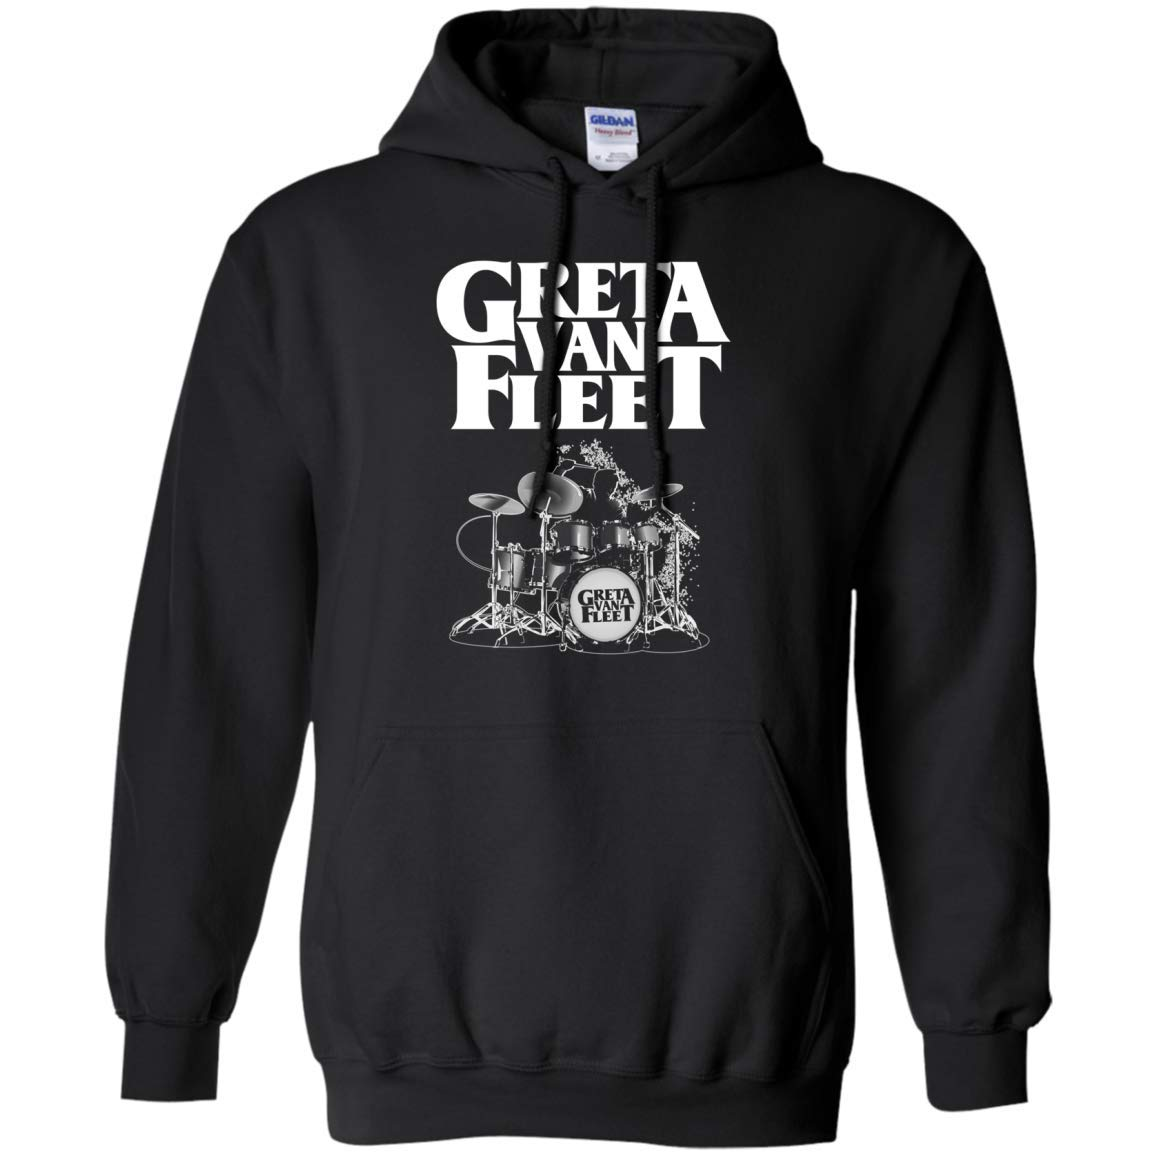 Black XXXXLarge Tee4you Greta Van Fleet Drum Hoodie